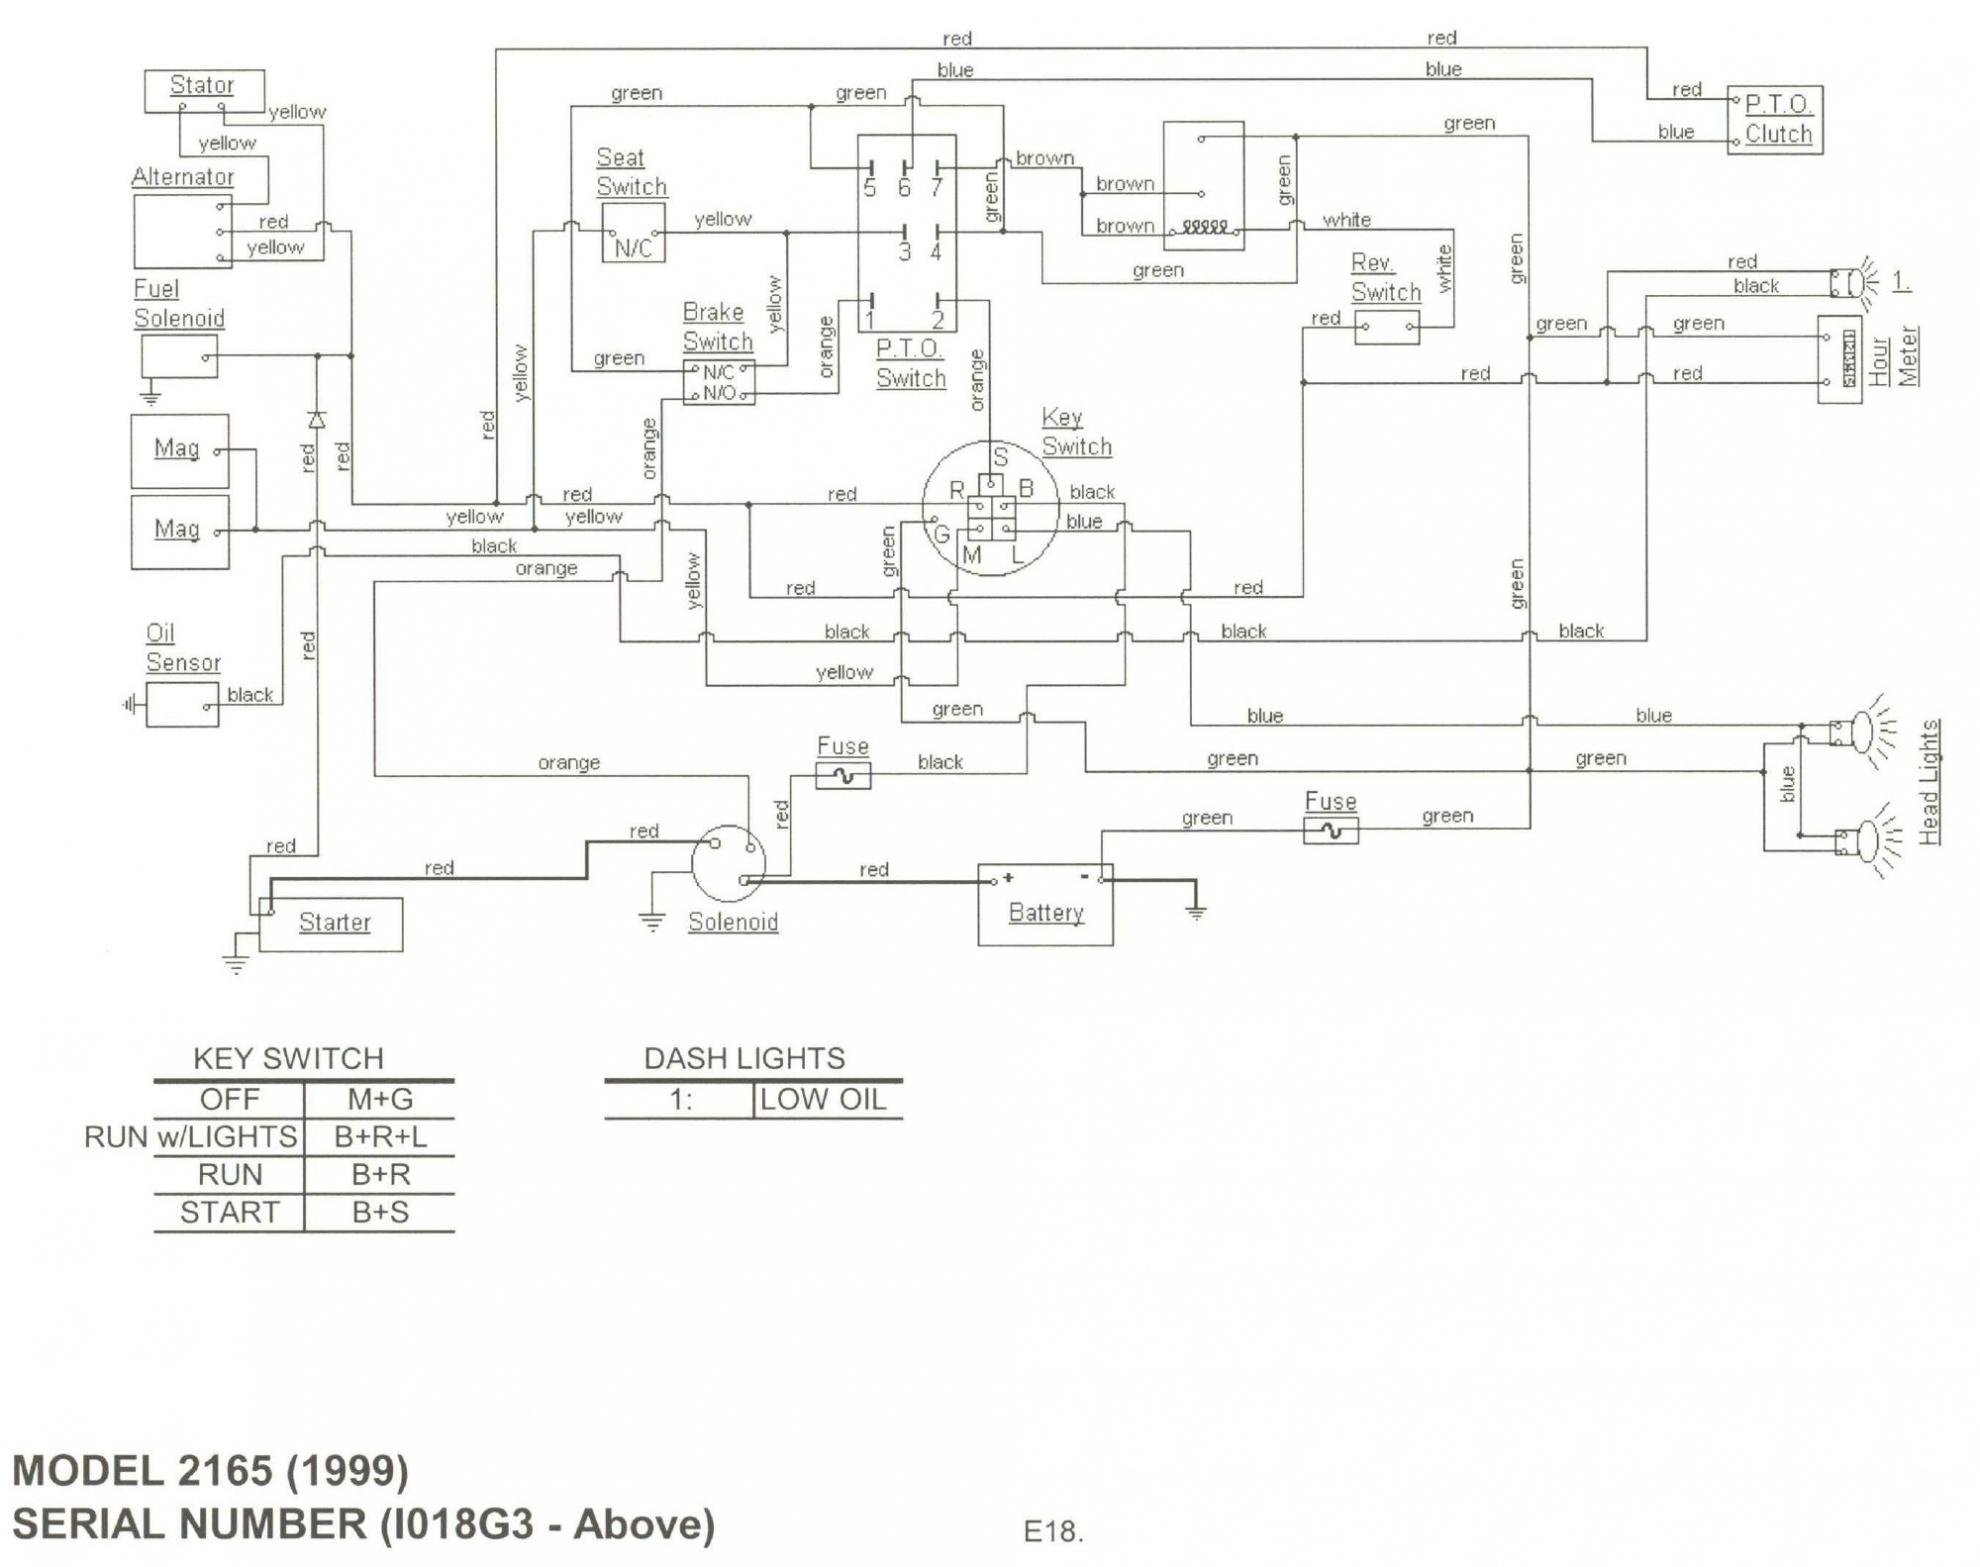 Cub Cadet Rzt 50 Wiring Diagram | Wiring Diagram